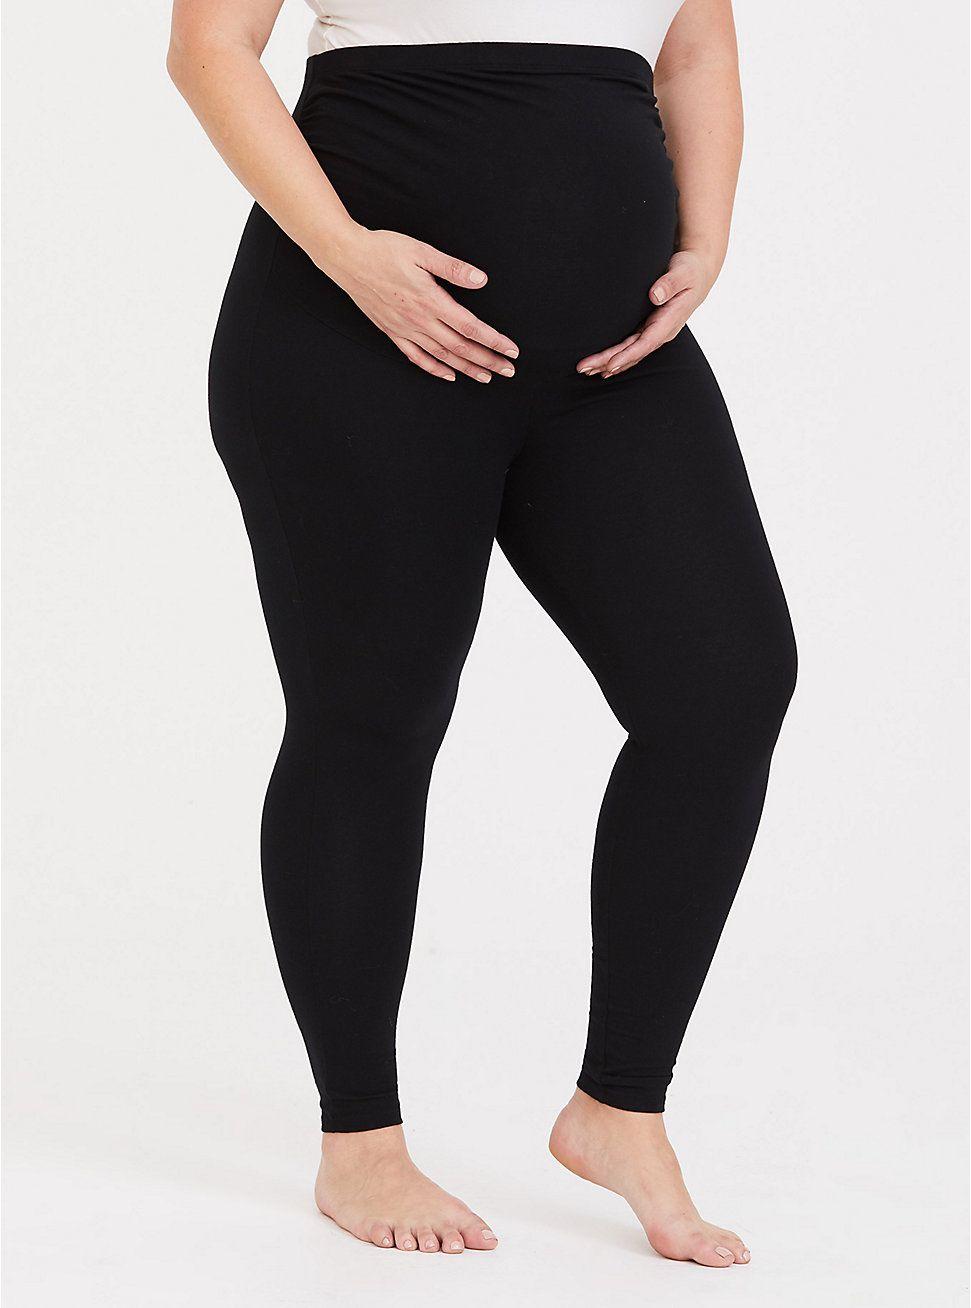 Plus Size Leggings Plus Size Pants Maternity Leggings High Waist Maternity Leggings Maternity Pants